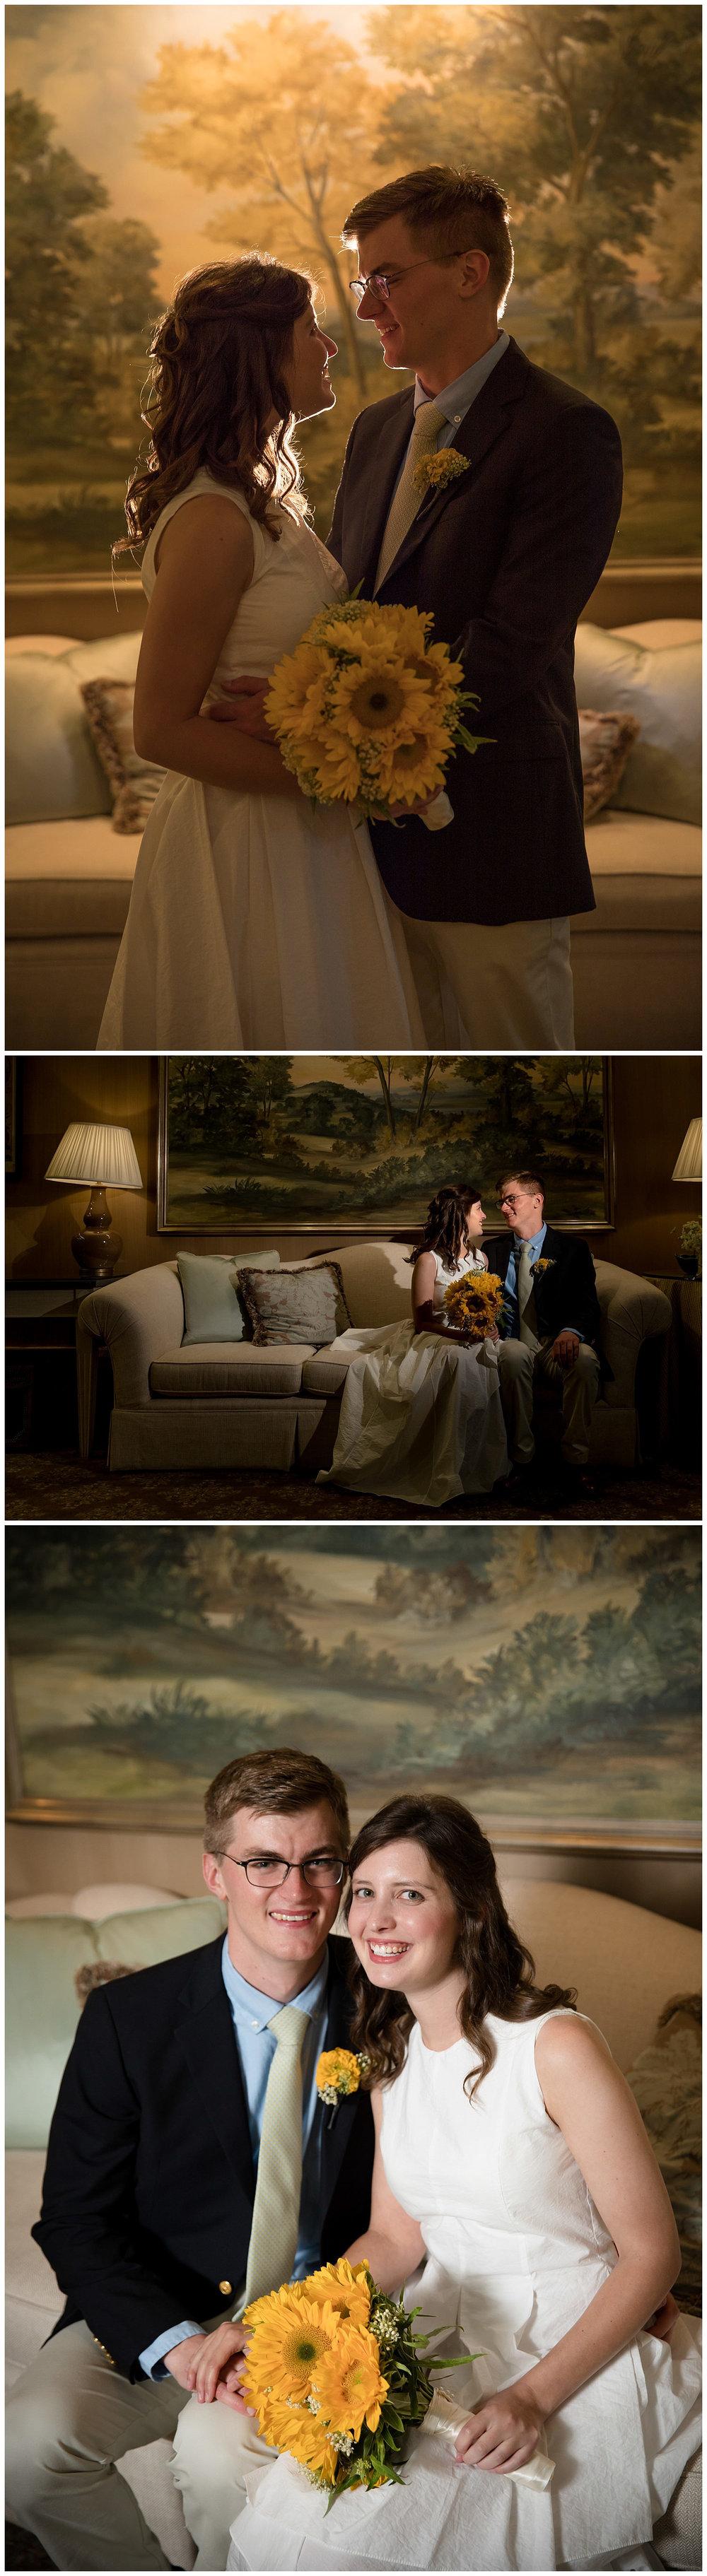 pine-brook-country-club-wedding-26-north-studios-9